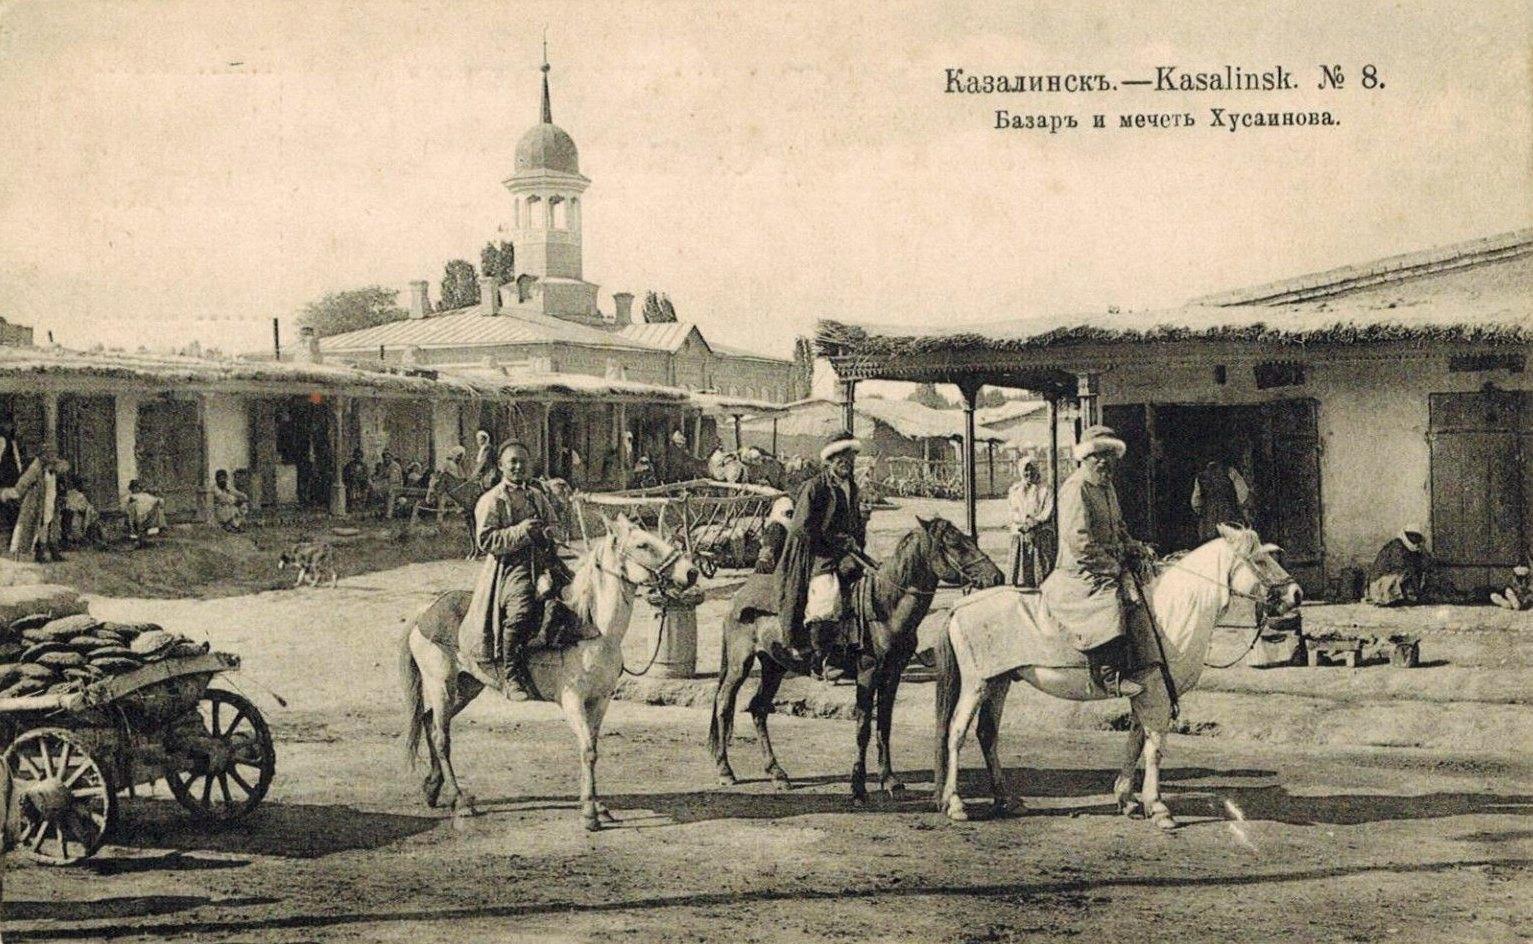 Базар и мечеть Хусаинова